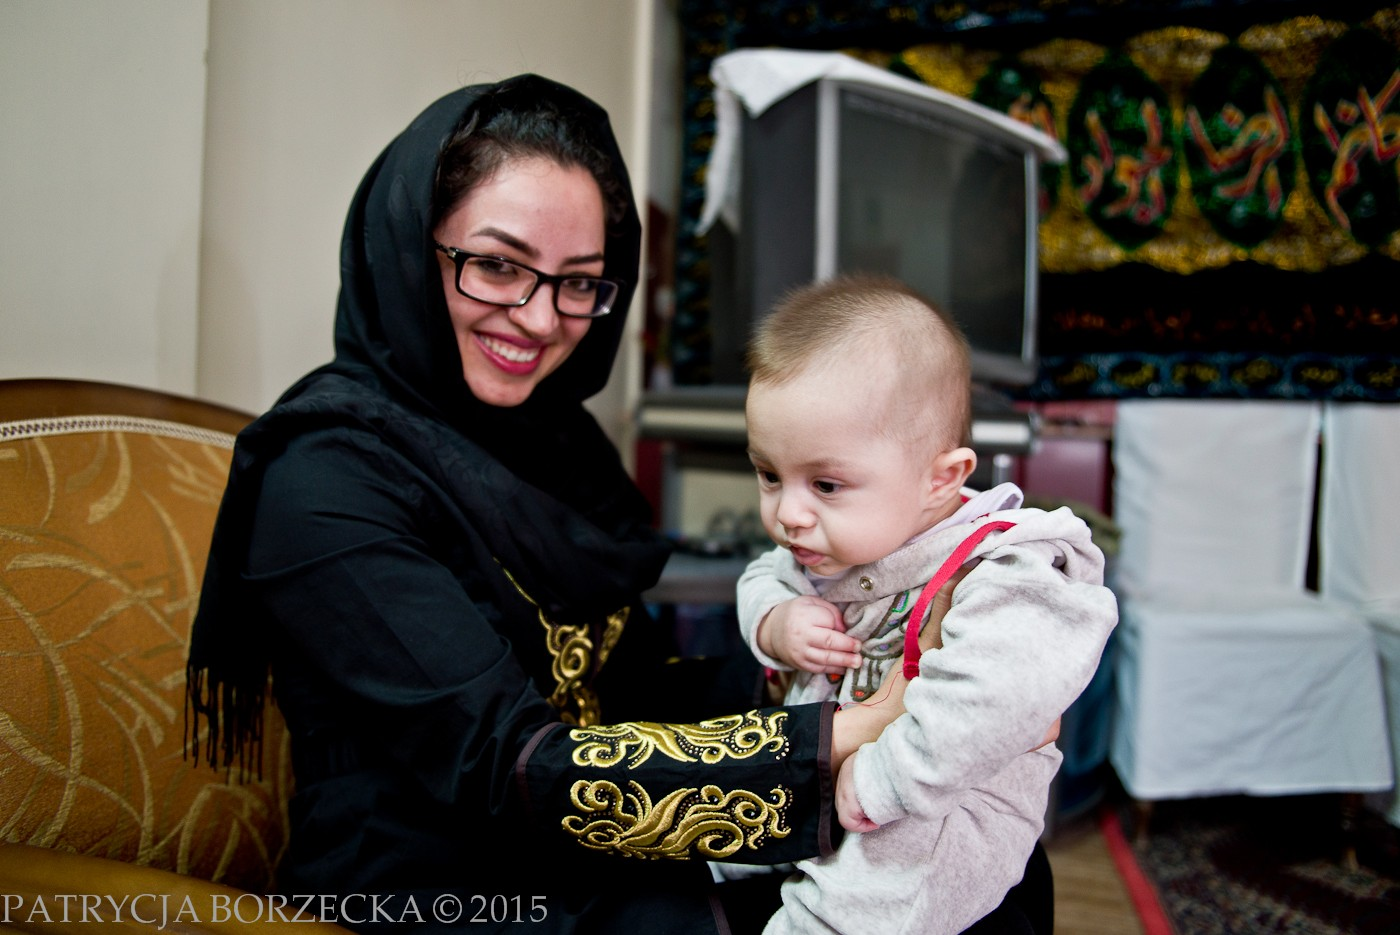 PatrycjaBorzecka-photography-Iran-people03